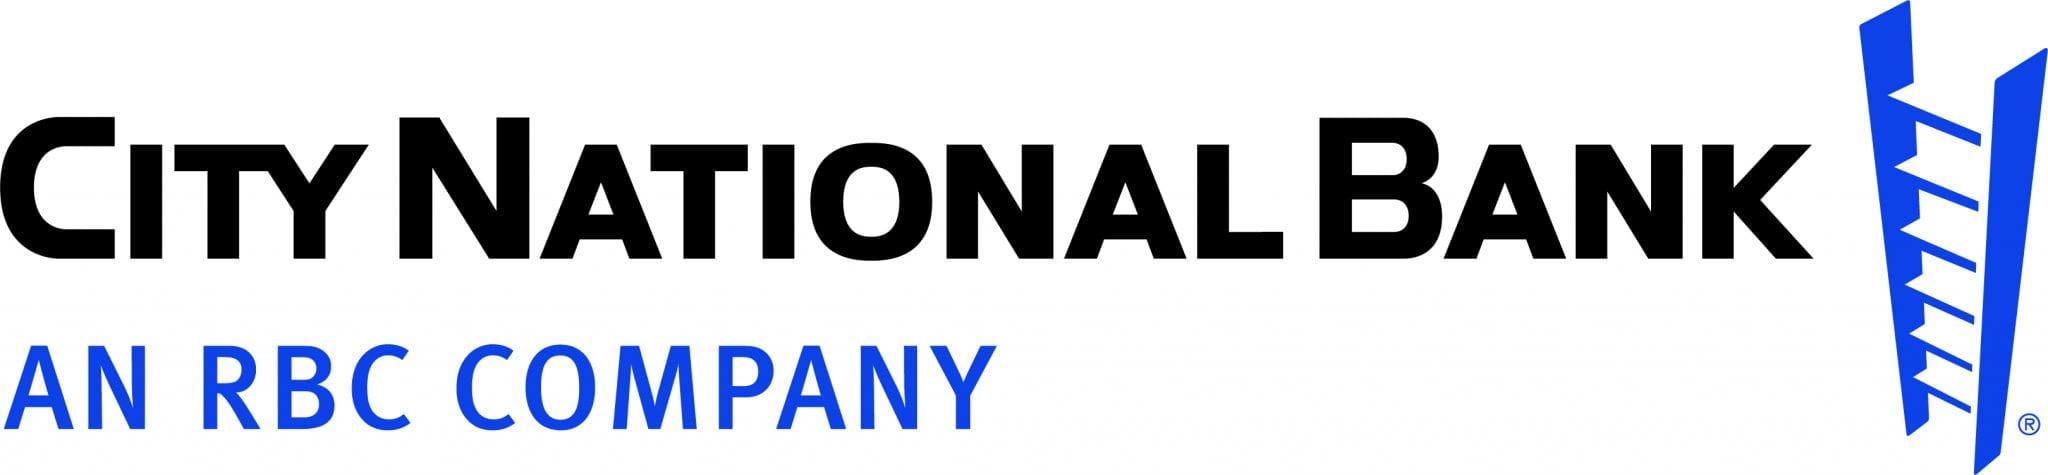 CNB-RBC Integrated Logo_Color_NoShield1